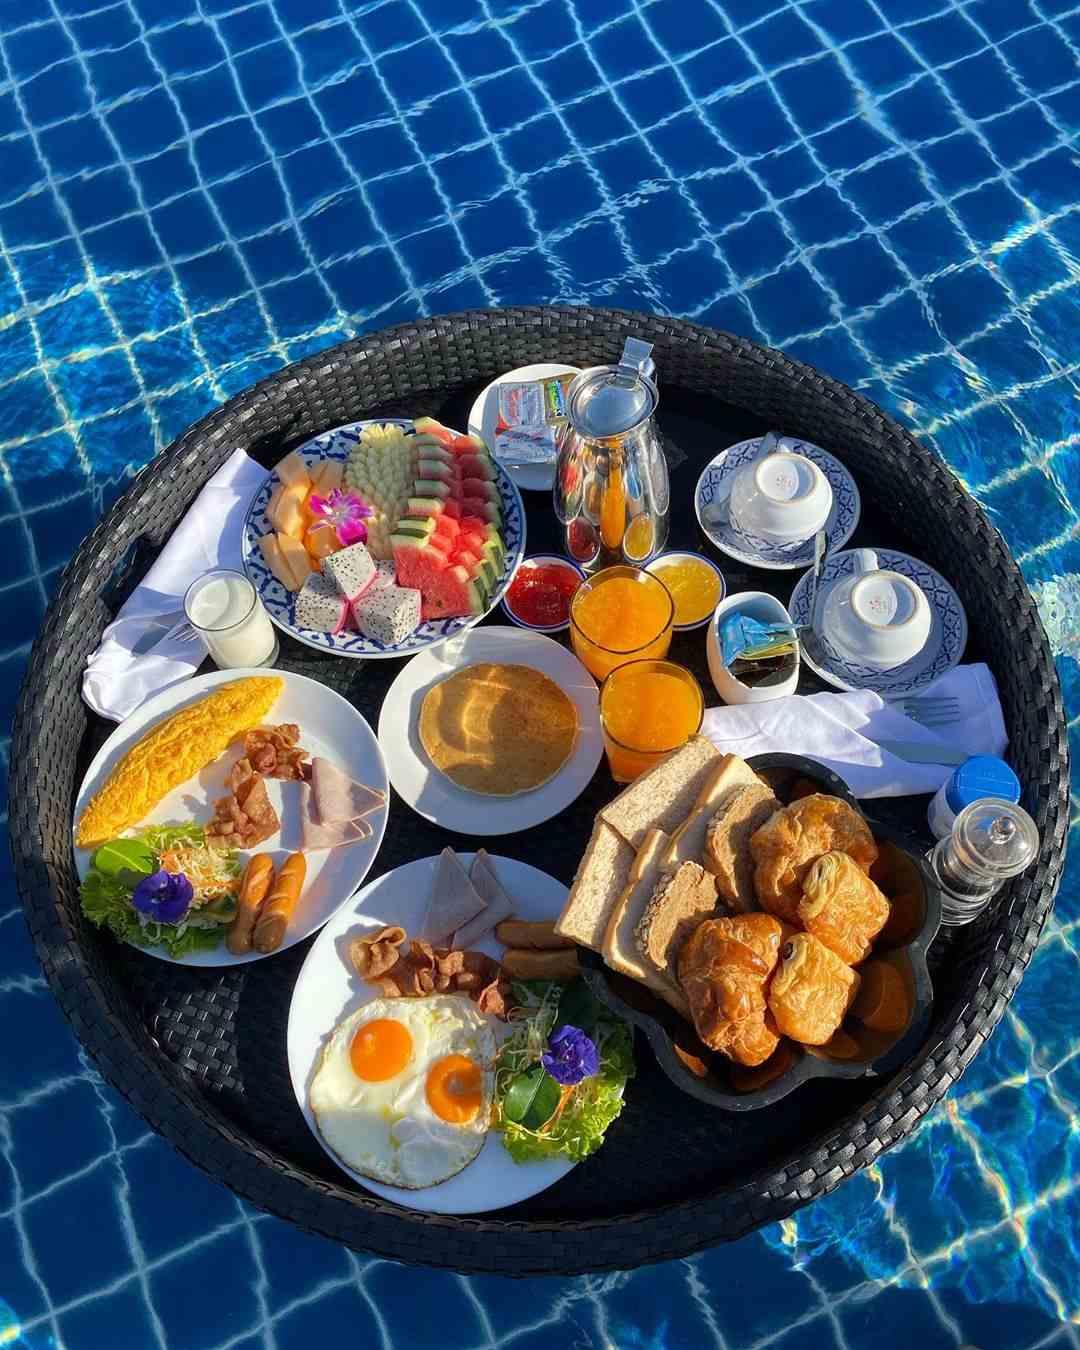 Floating Breakfast in the pool of Lanta Casa Blanca on Koh Lanta, Thailand